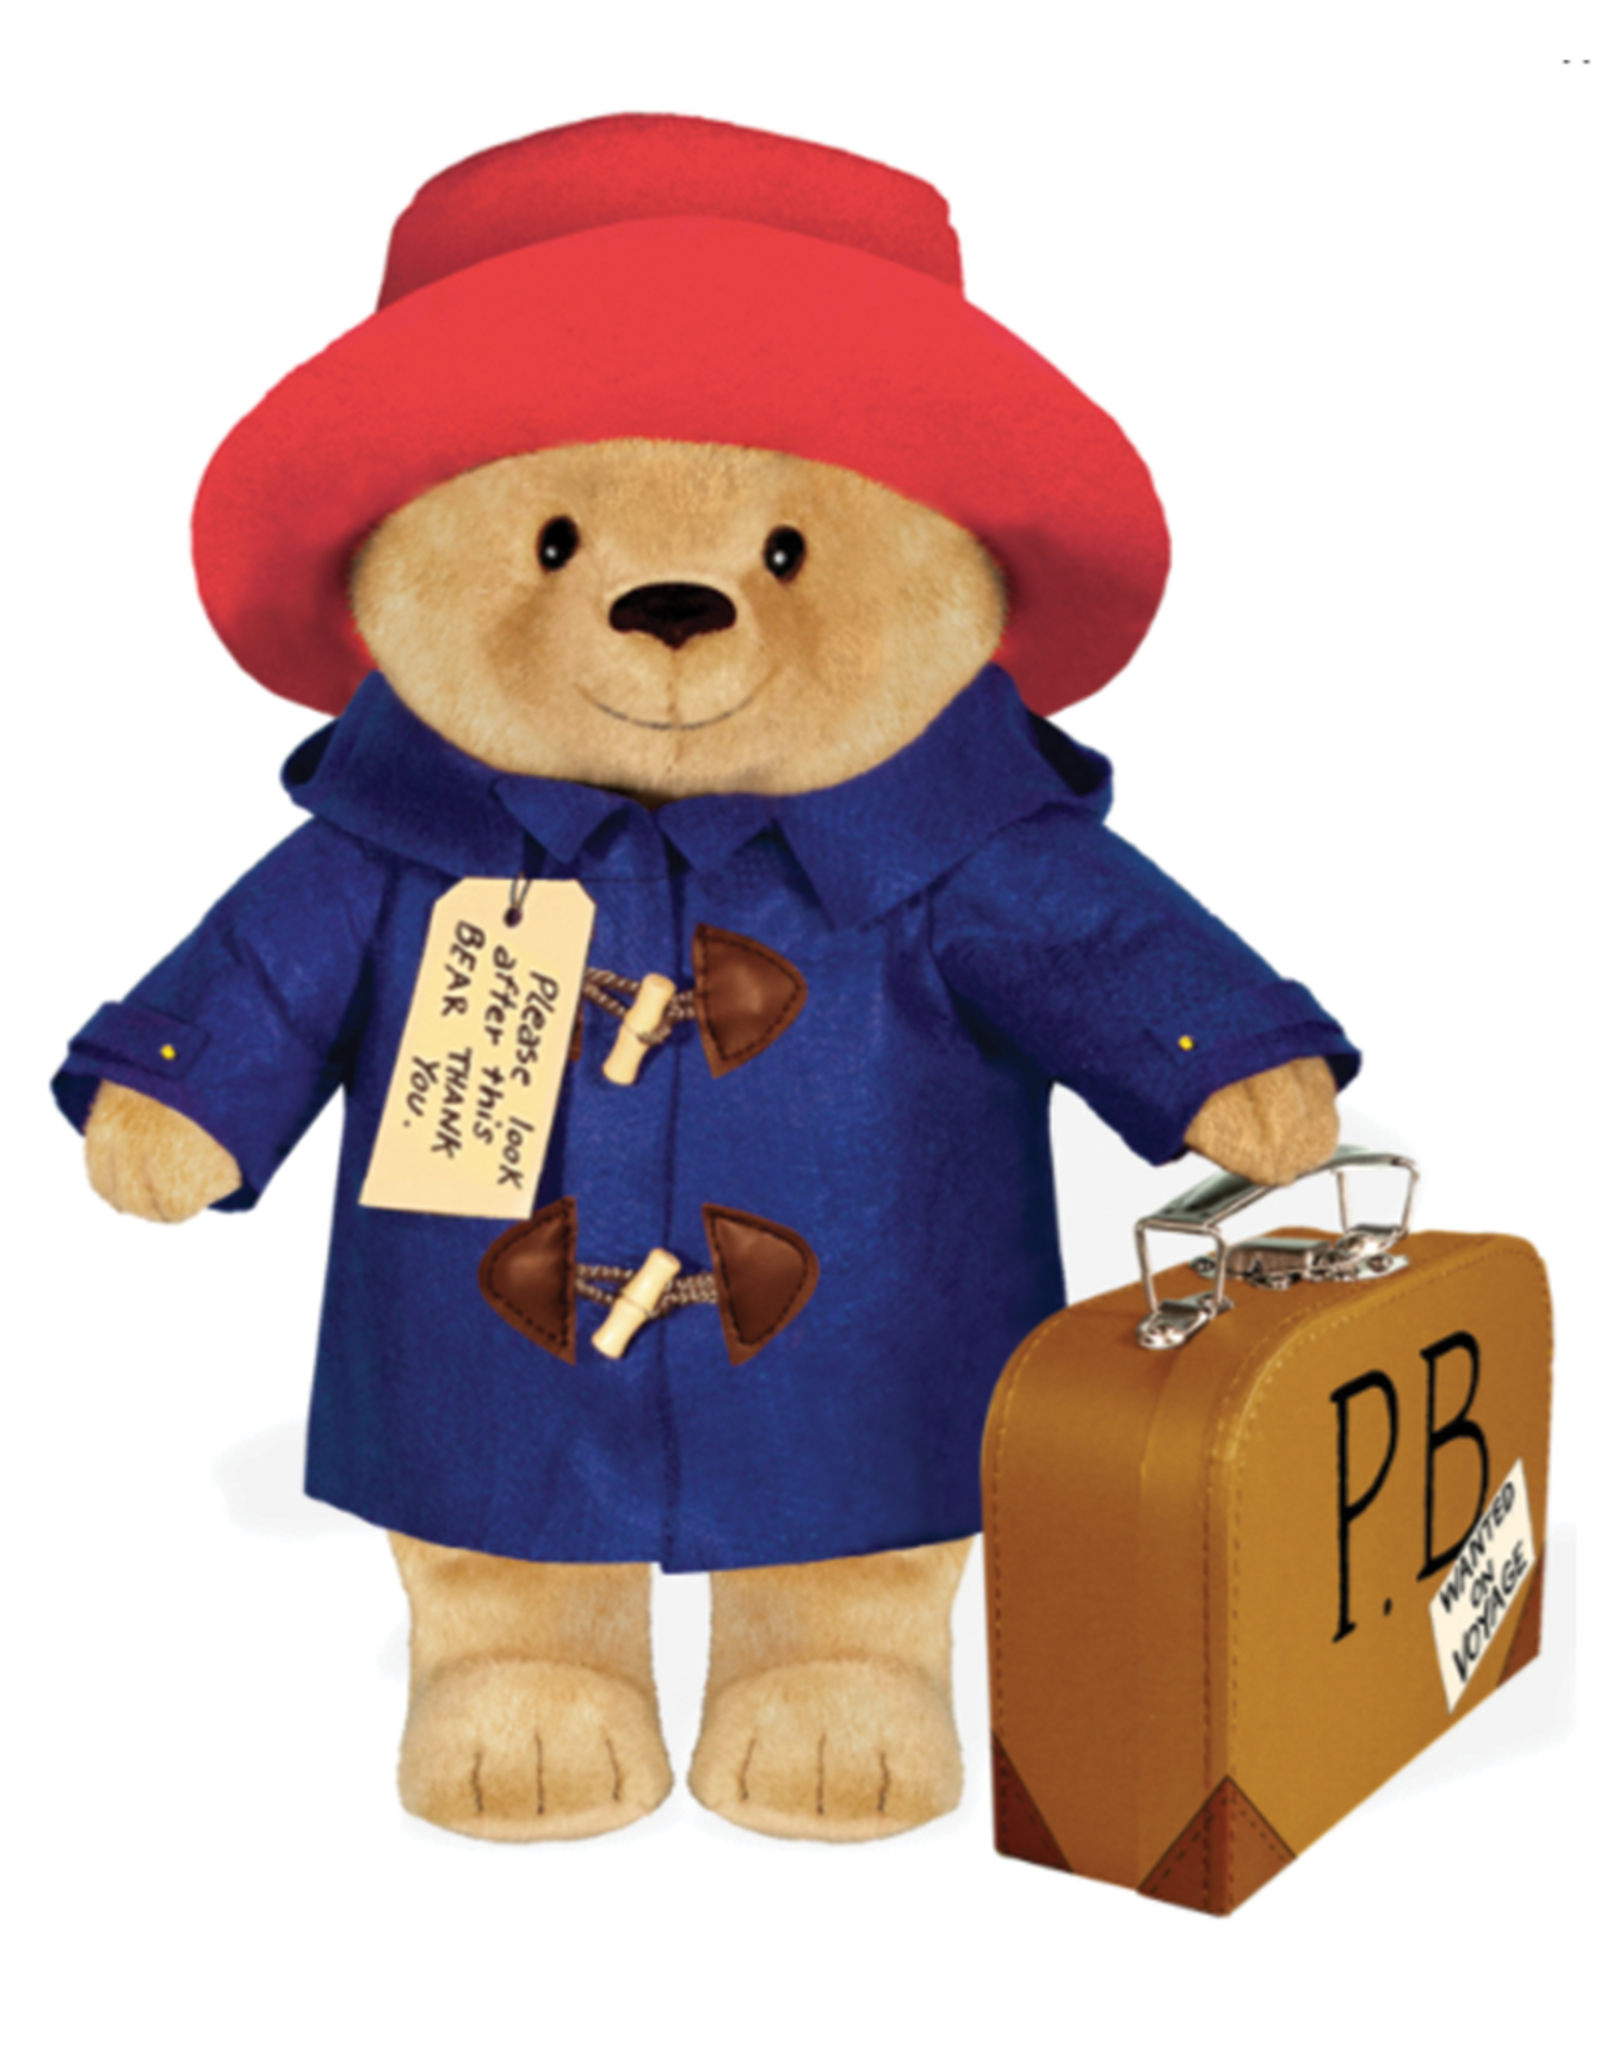 "Yottoy Paddington Bear, 16"" Doll with Suitcase"